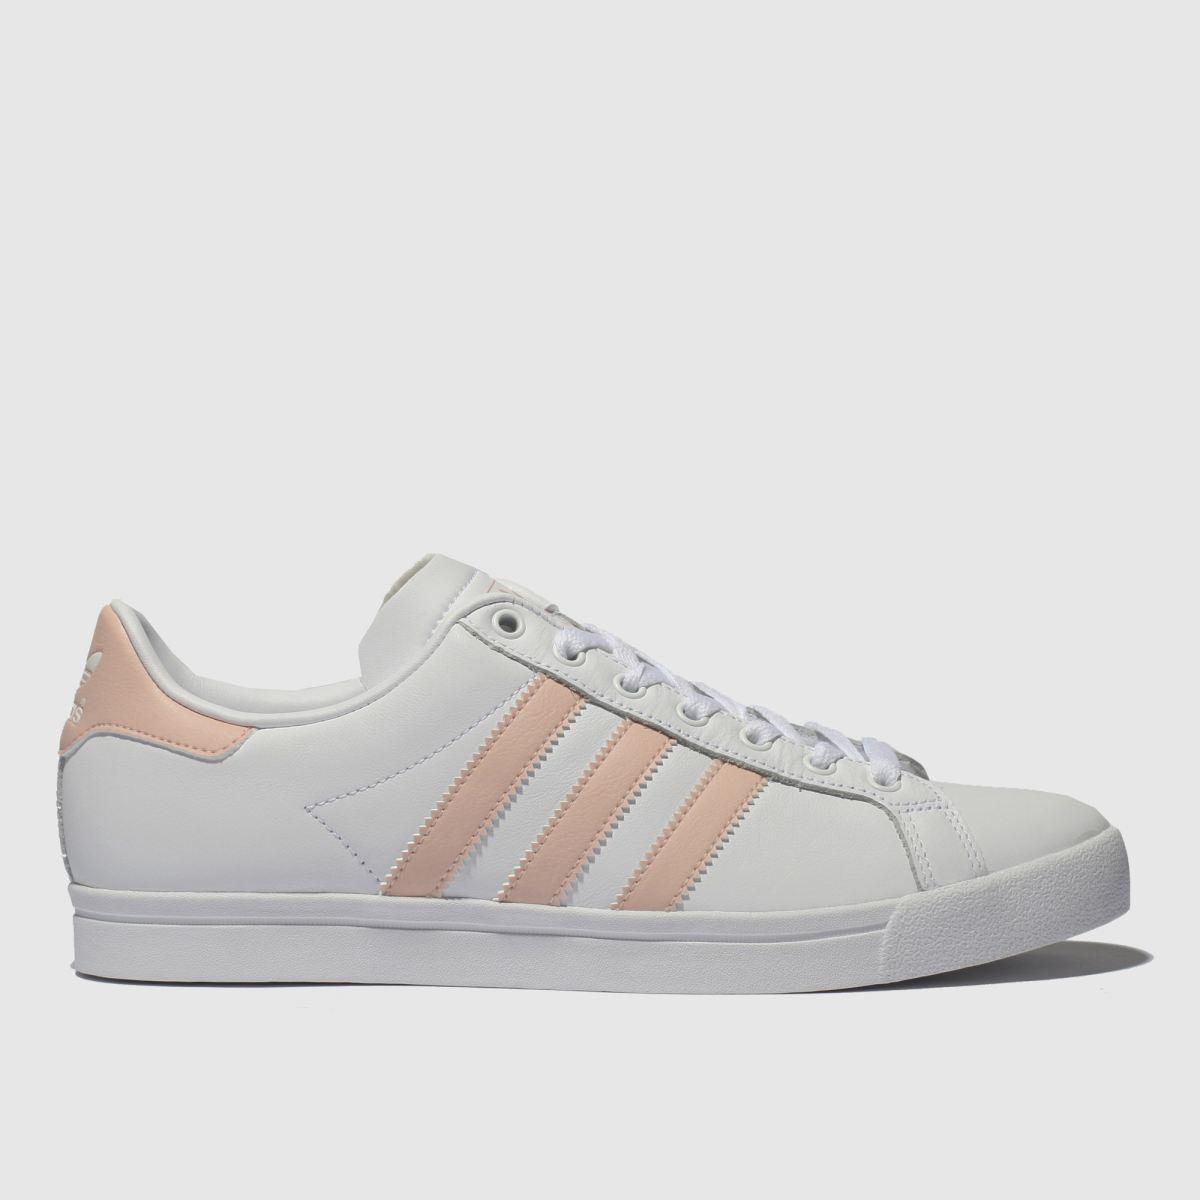 Adidas White & Pink Coast Star Trainers